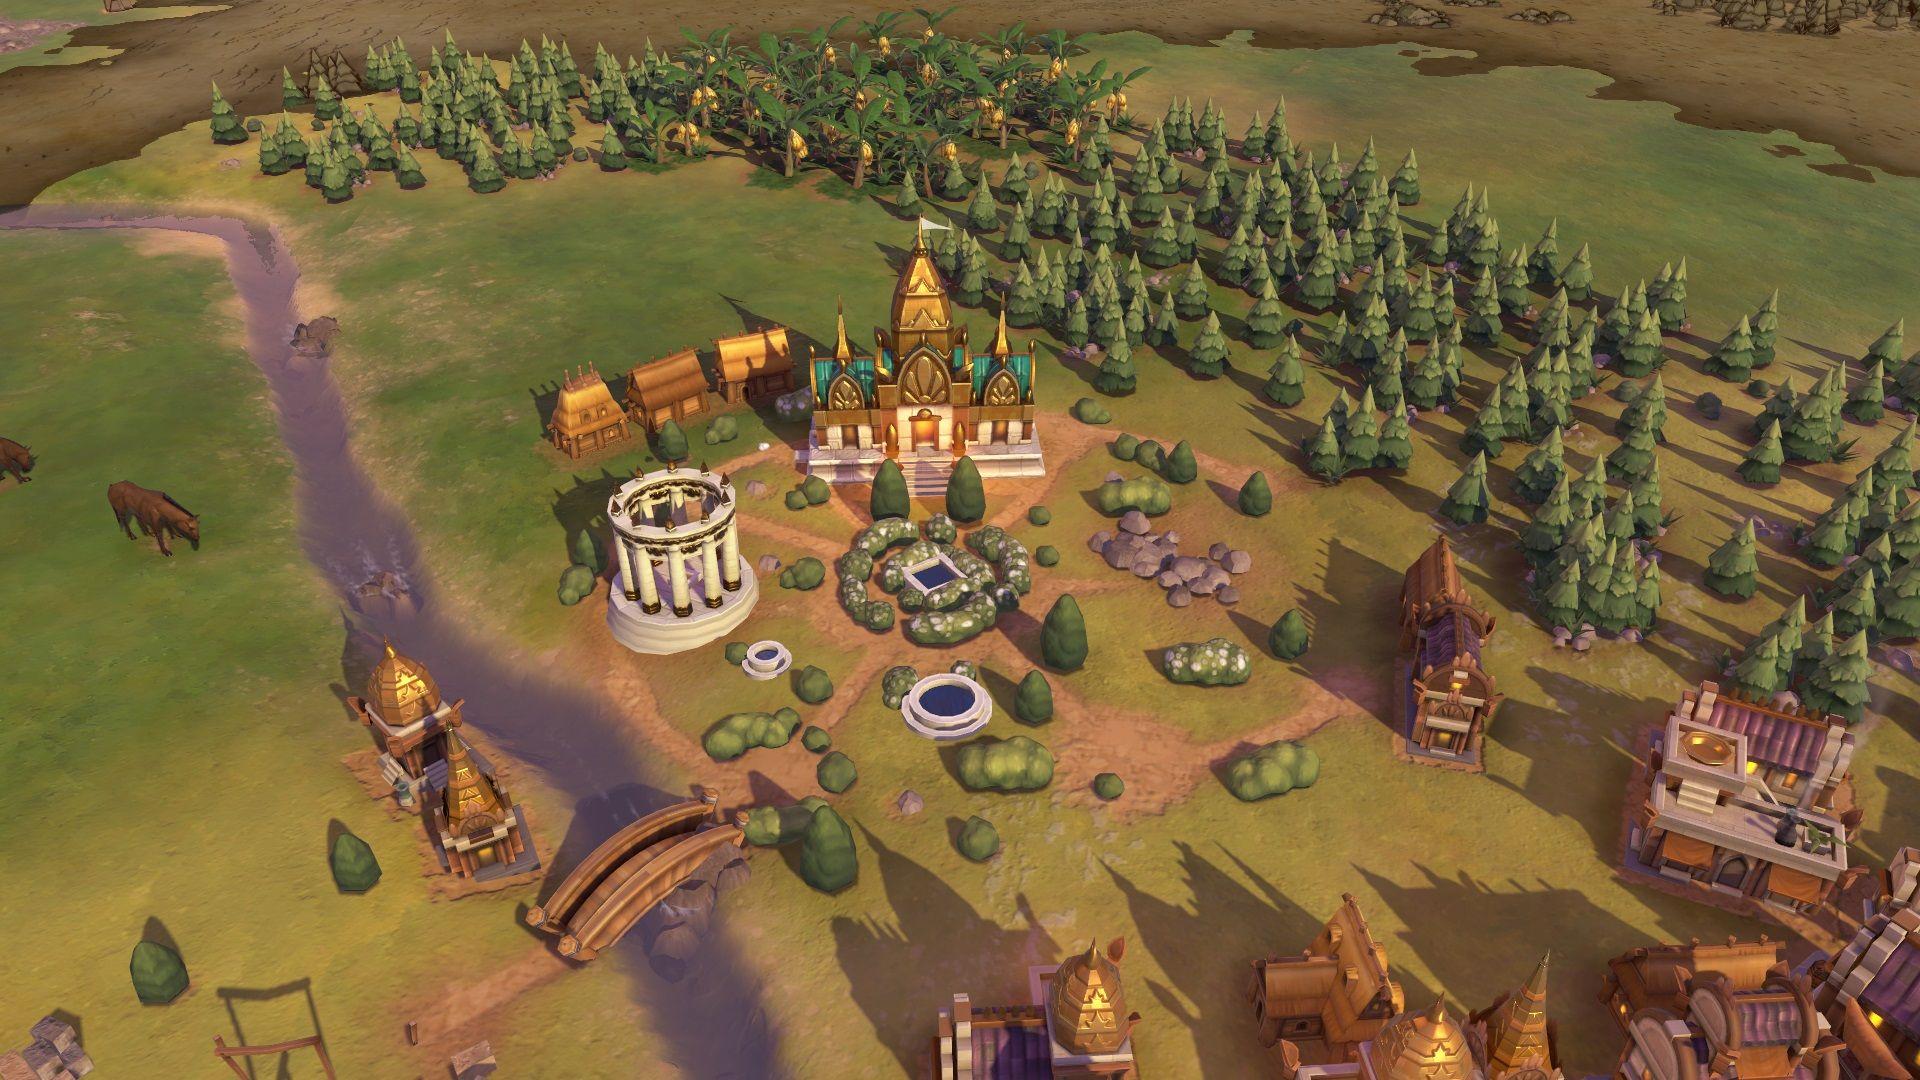 2KGMKT_CivilizationVI_Game-Image_DLC6_Prasat_2_3.jpg